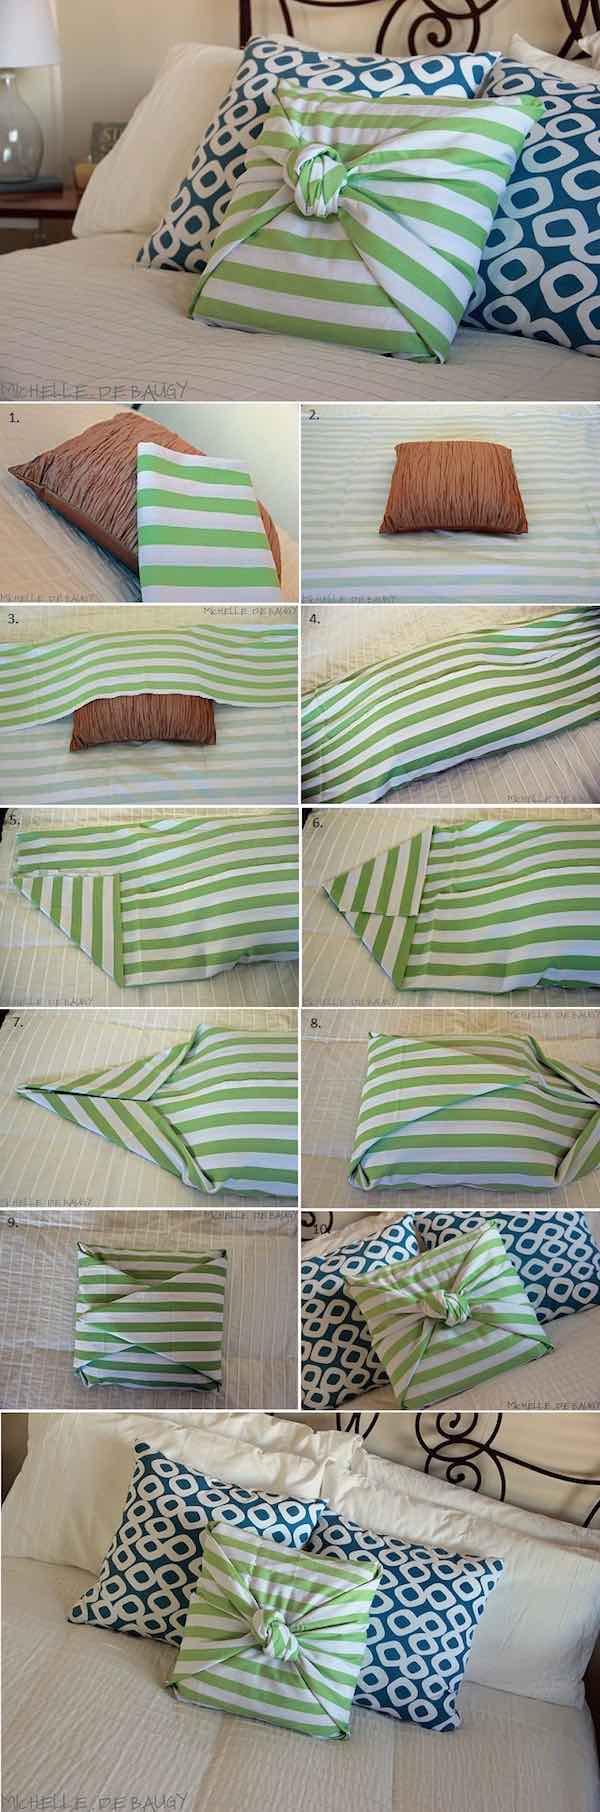 Cojines sin coser